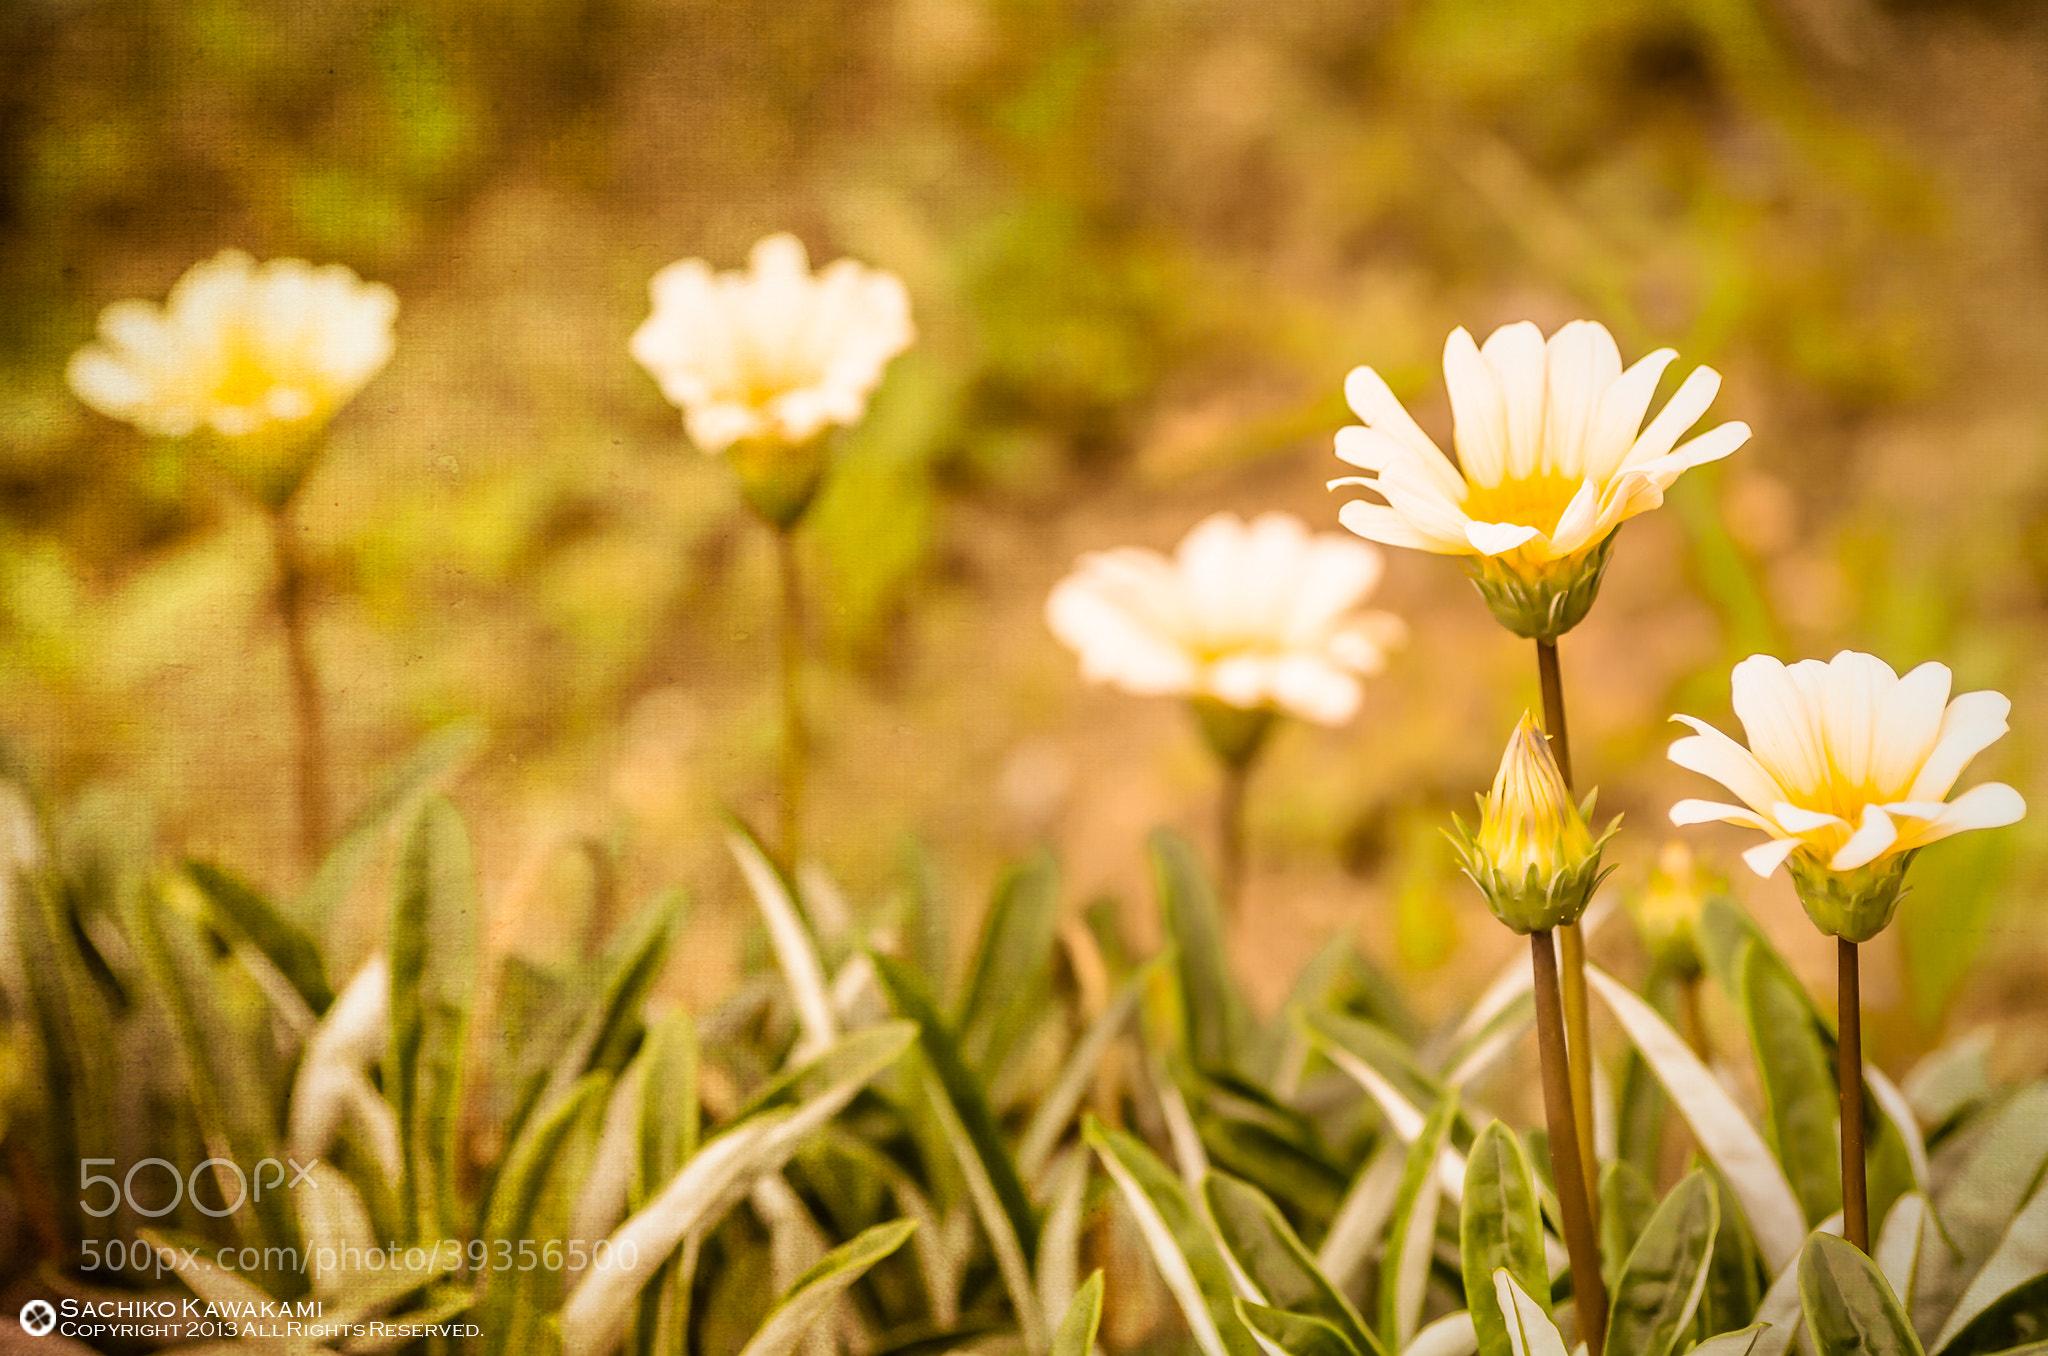 Photograph Gently by Sachiko Kawakami on 500px